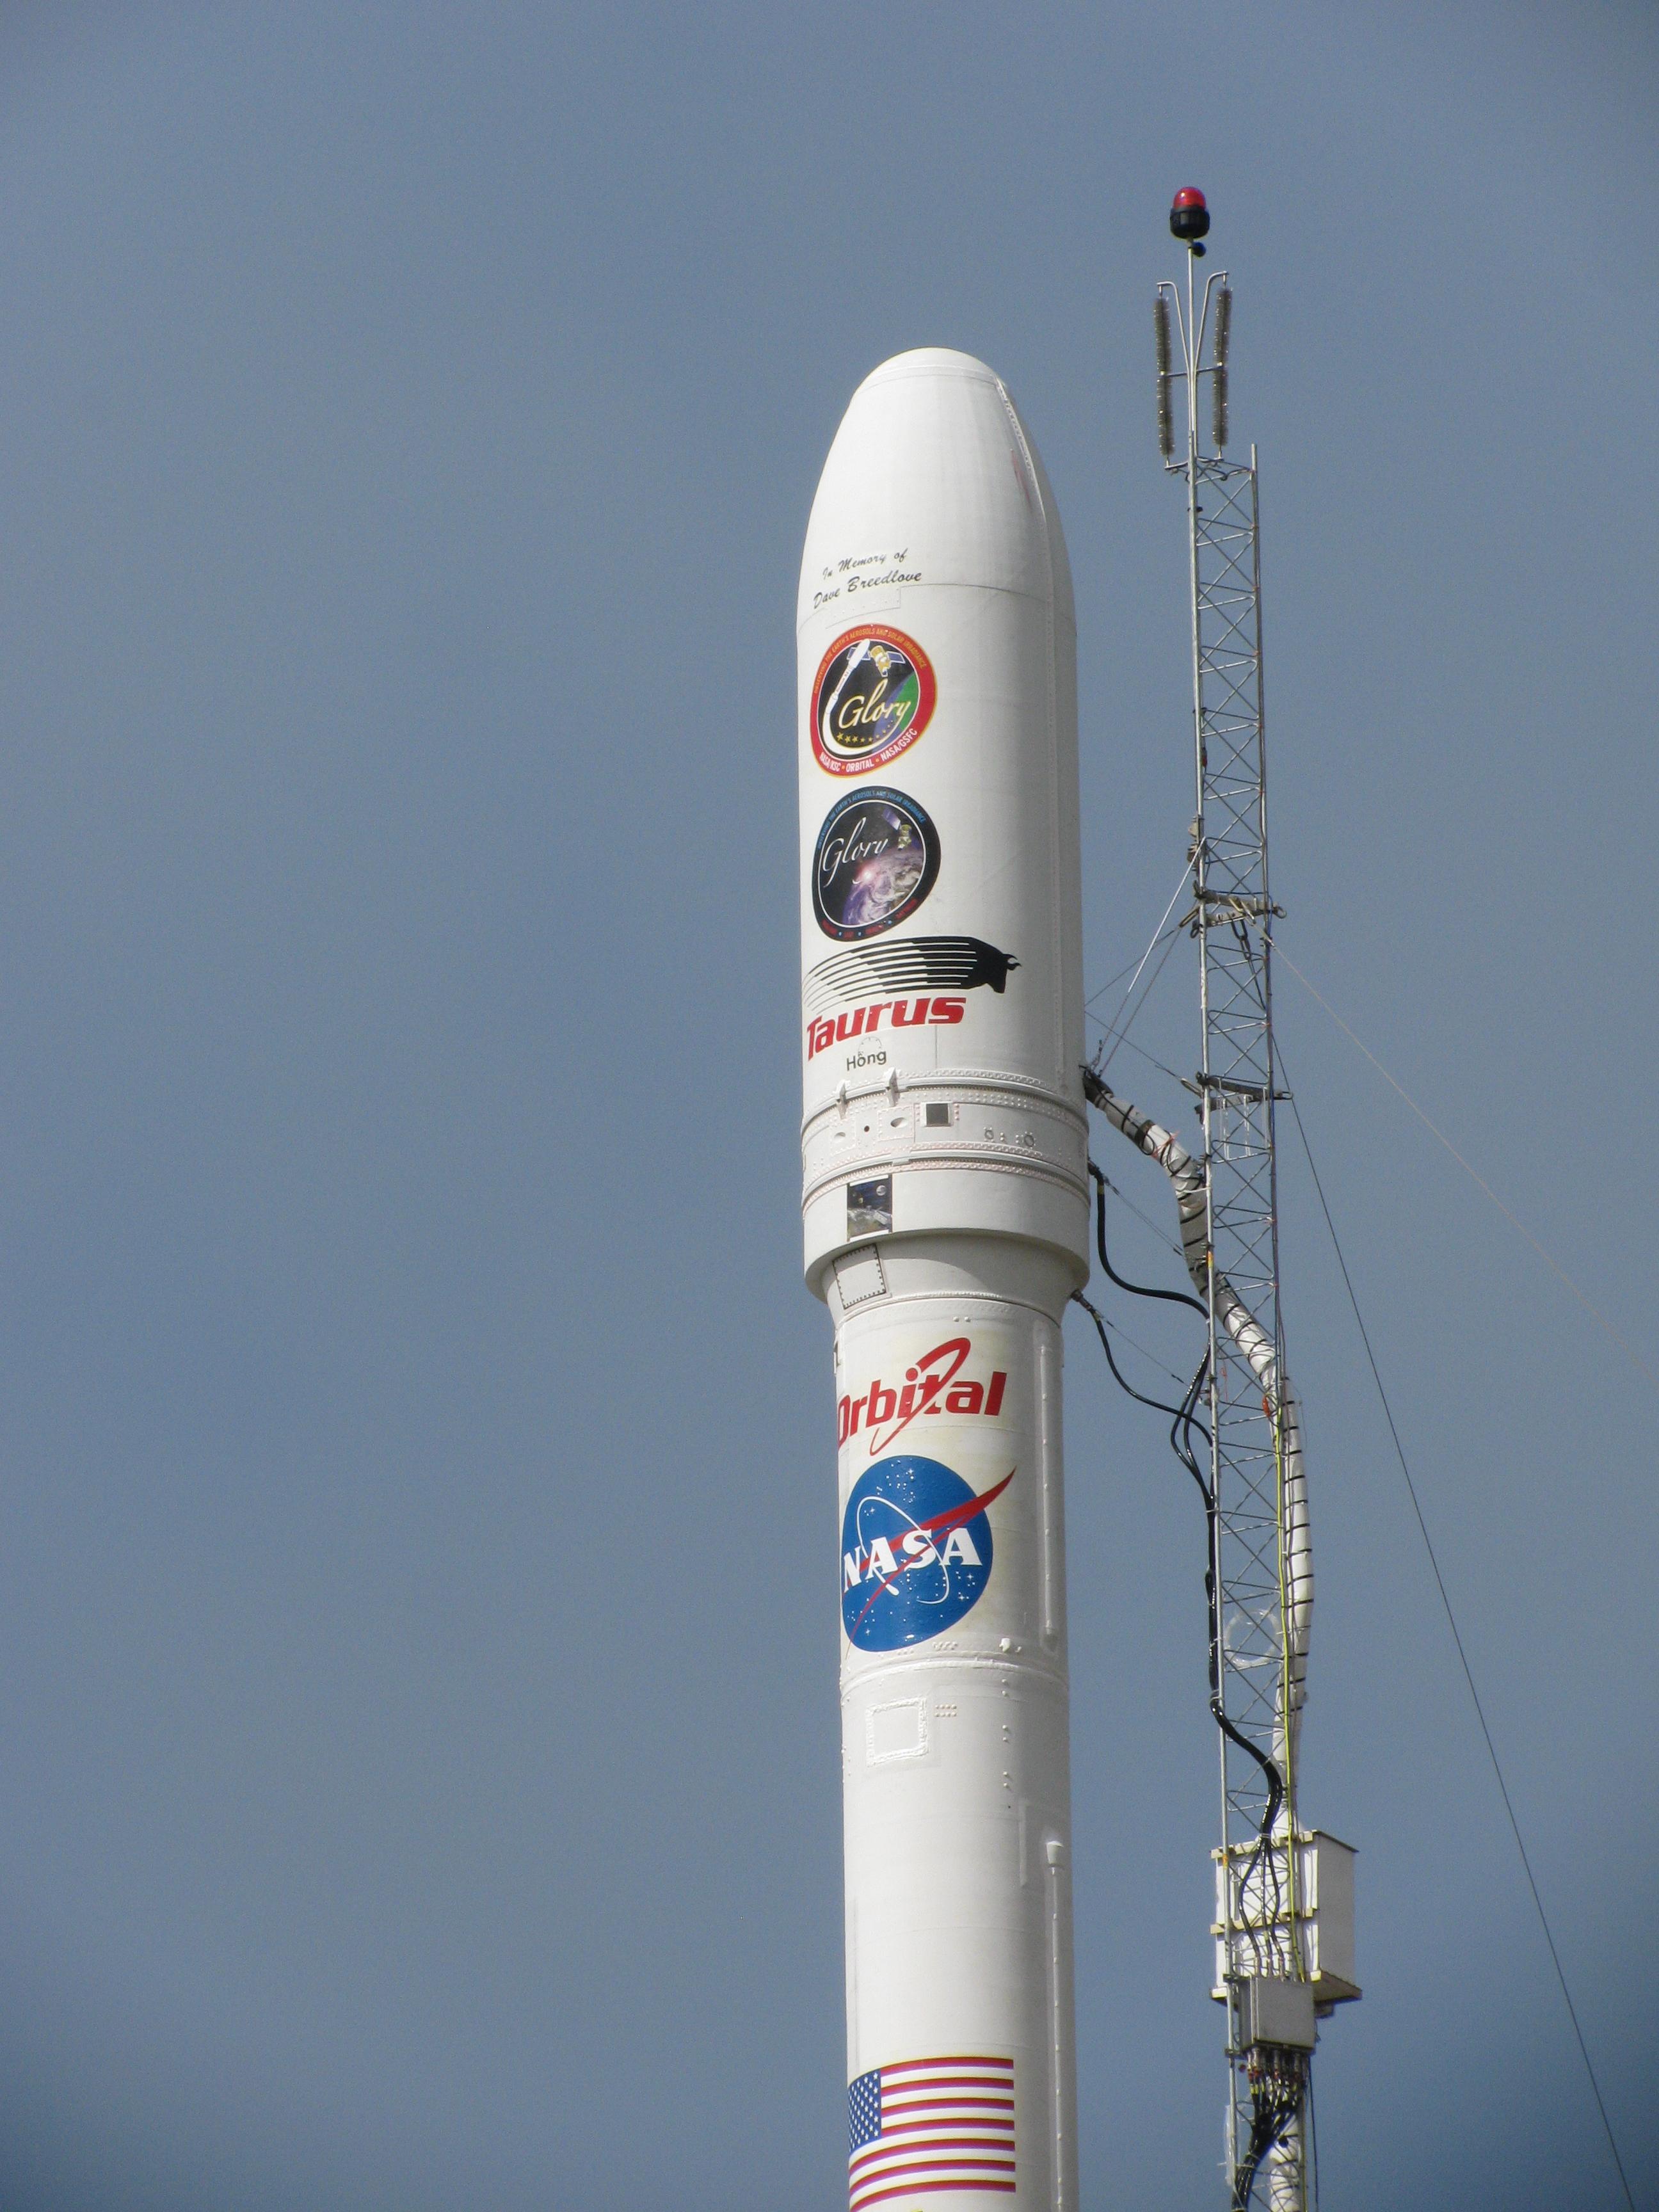 nasa rockets - photo #41